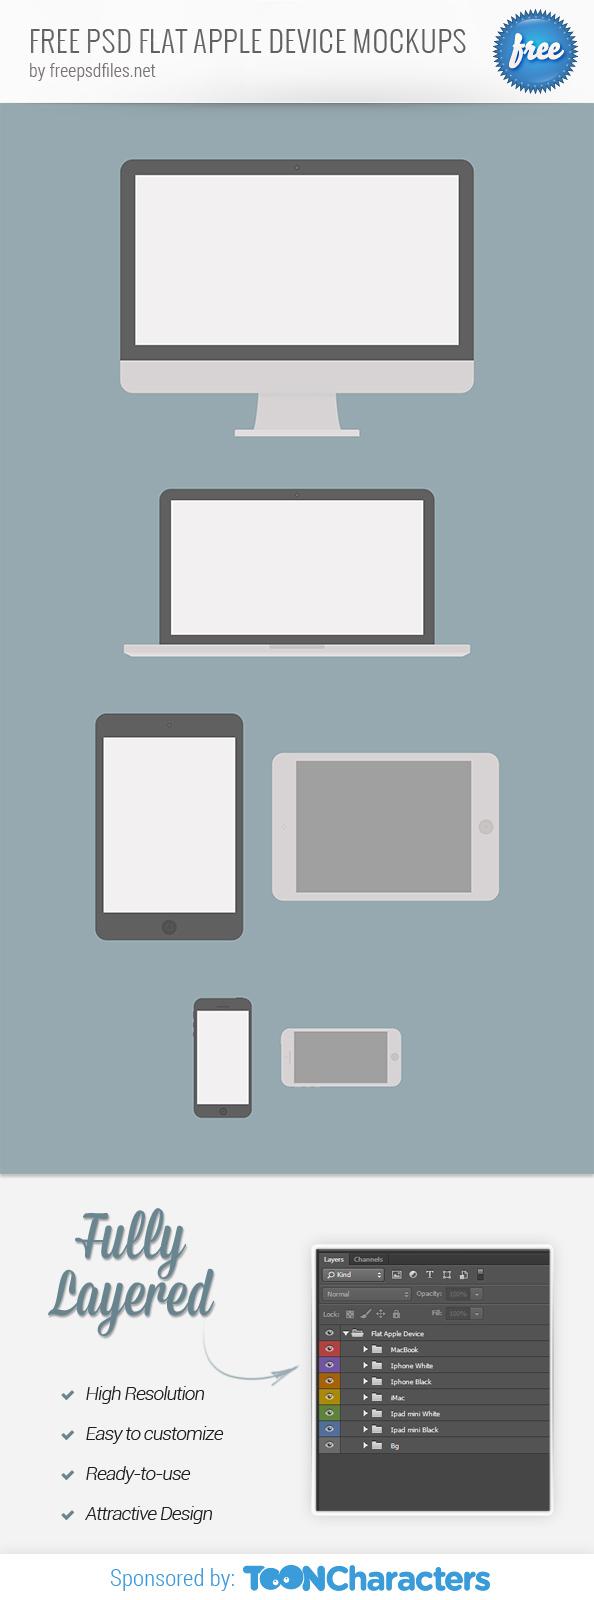 FREE PSD Flat Apple Device Mockups